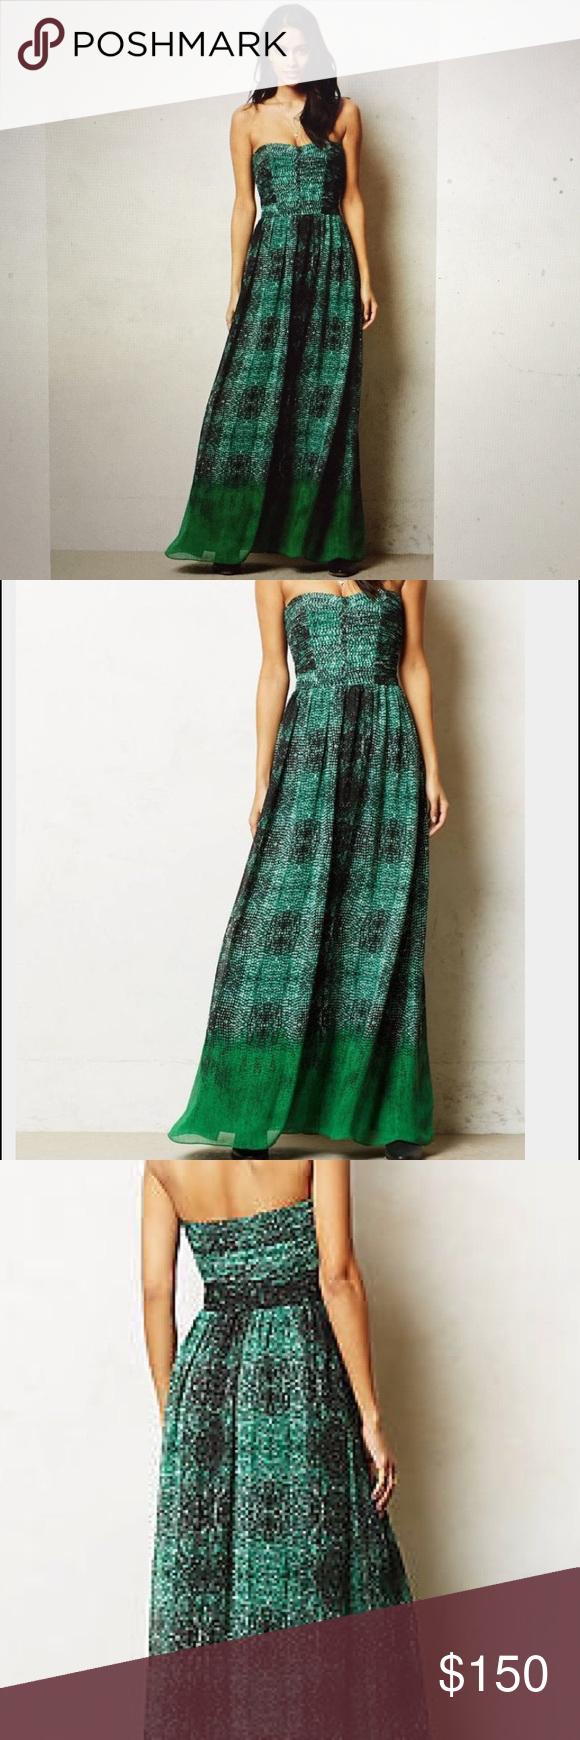 88f2414b7dde Anthropologie Vernalis MaxiDress Moulinette Souers Anthropologie Vernalis  Maxi Dress Size 2 petite, Green Snake Print